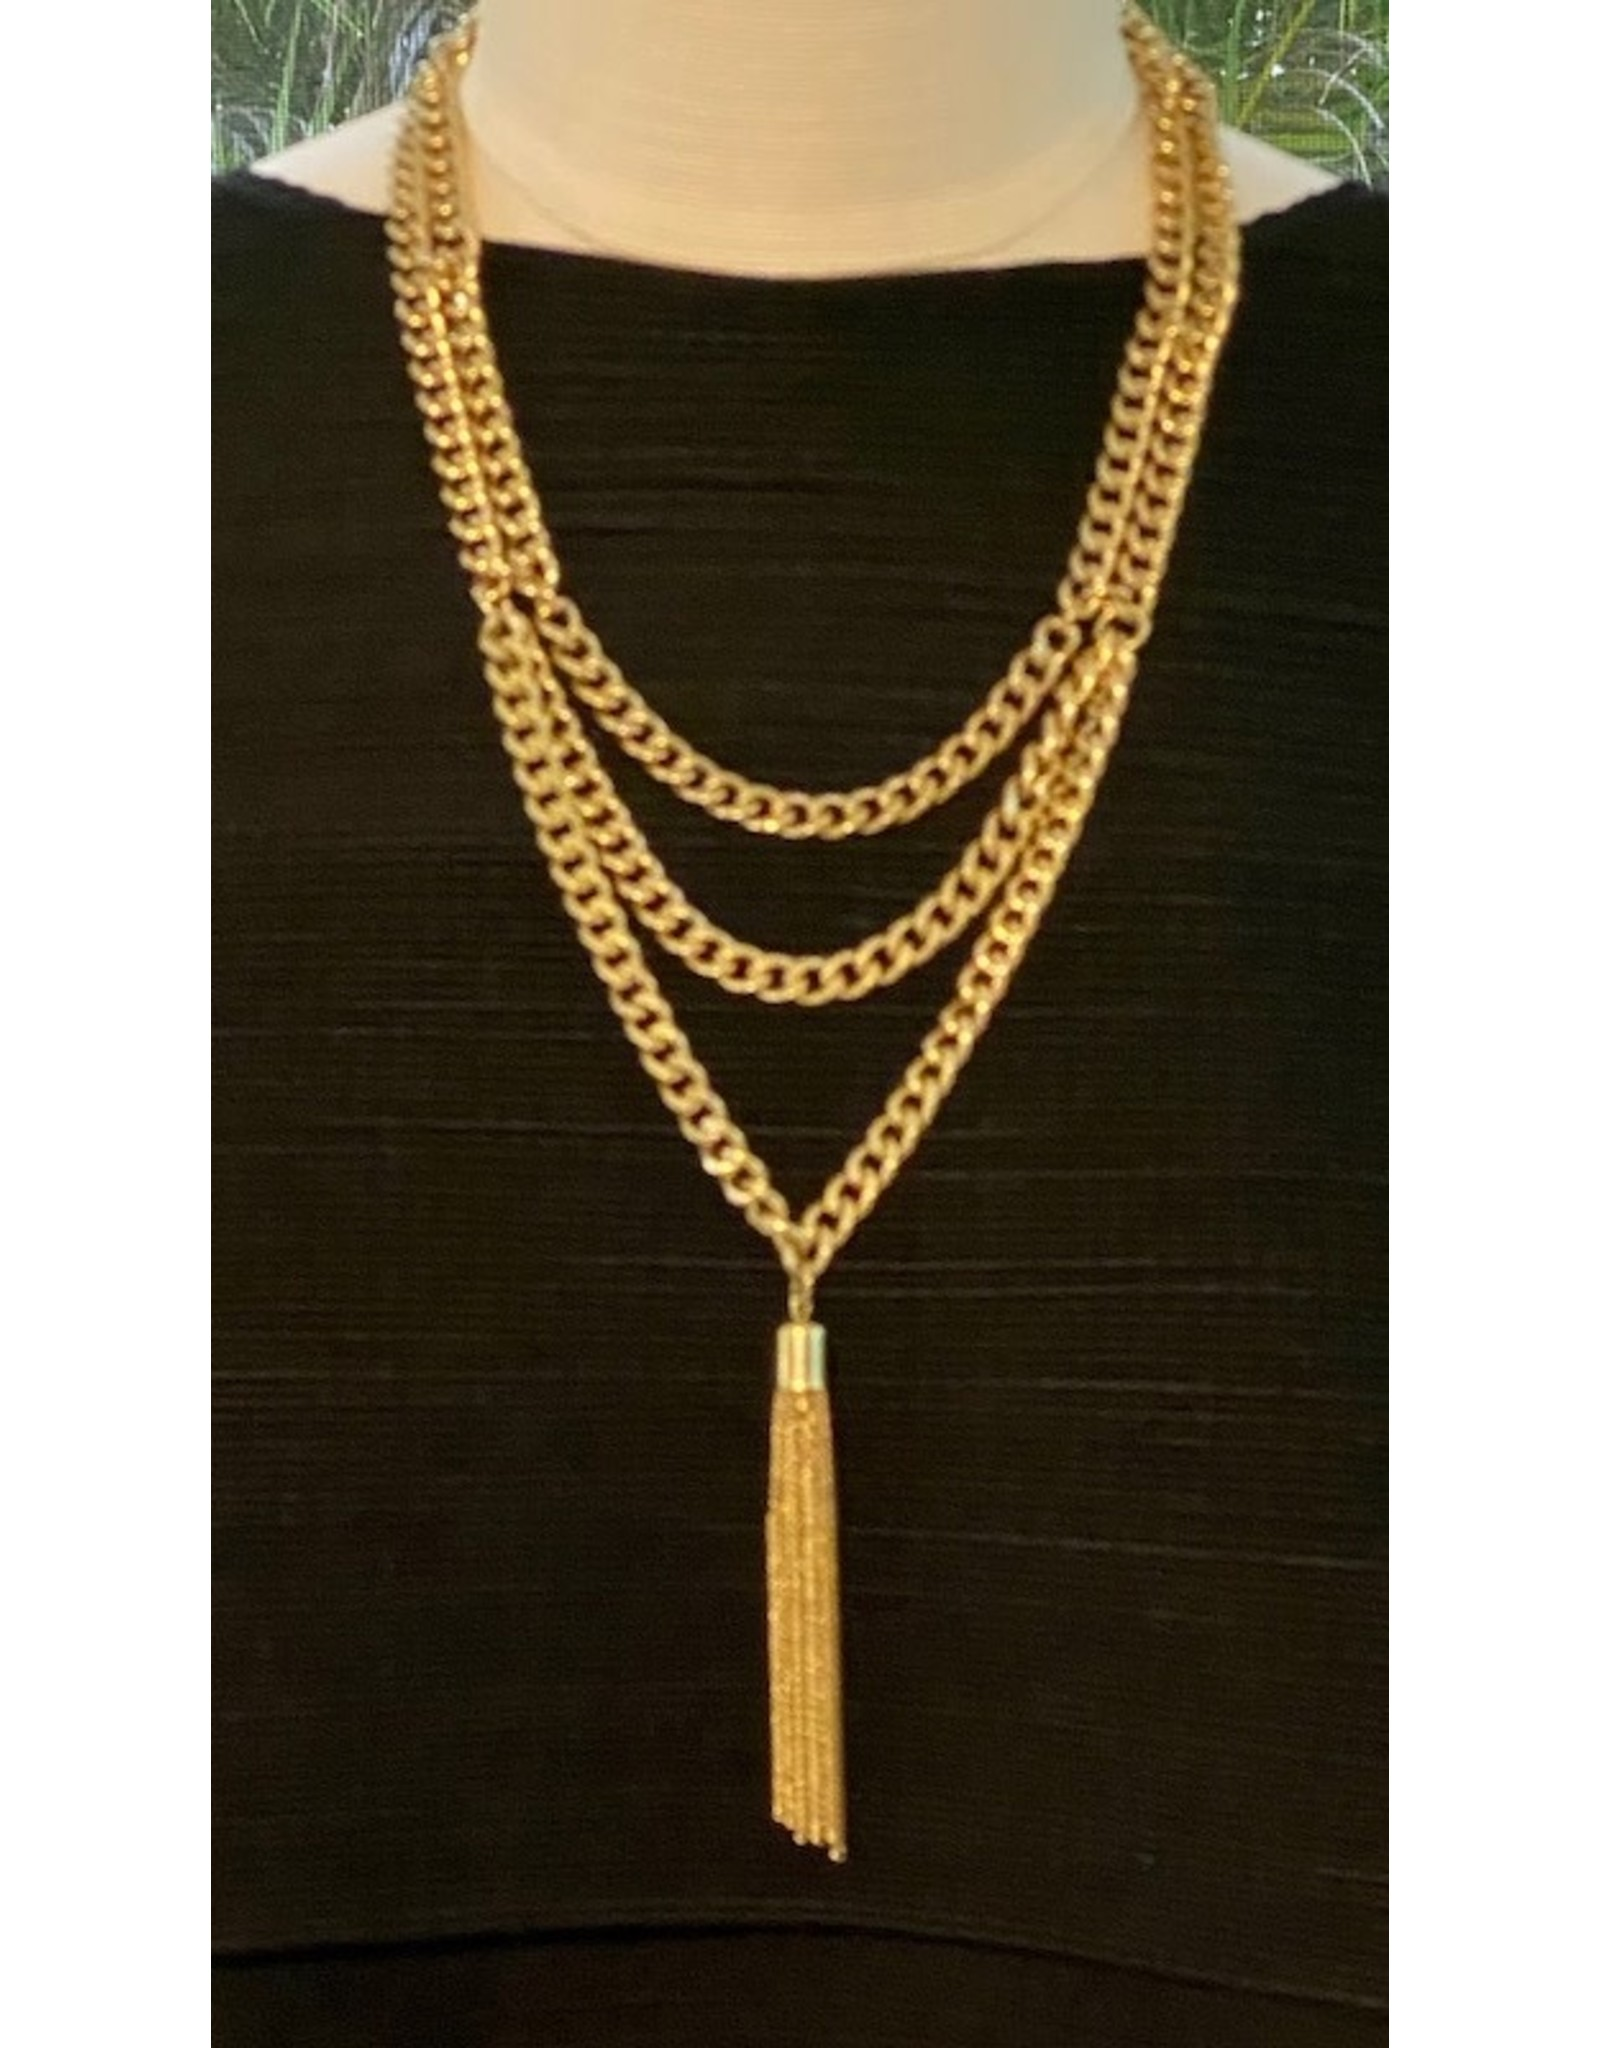 Karin Sultan Karin Sultan: Long with Tassel Gold